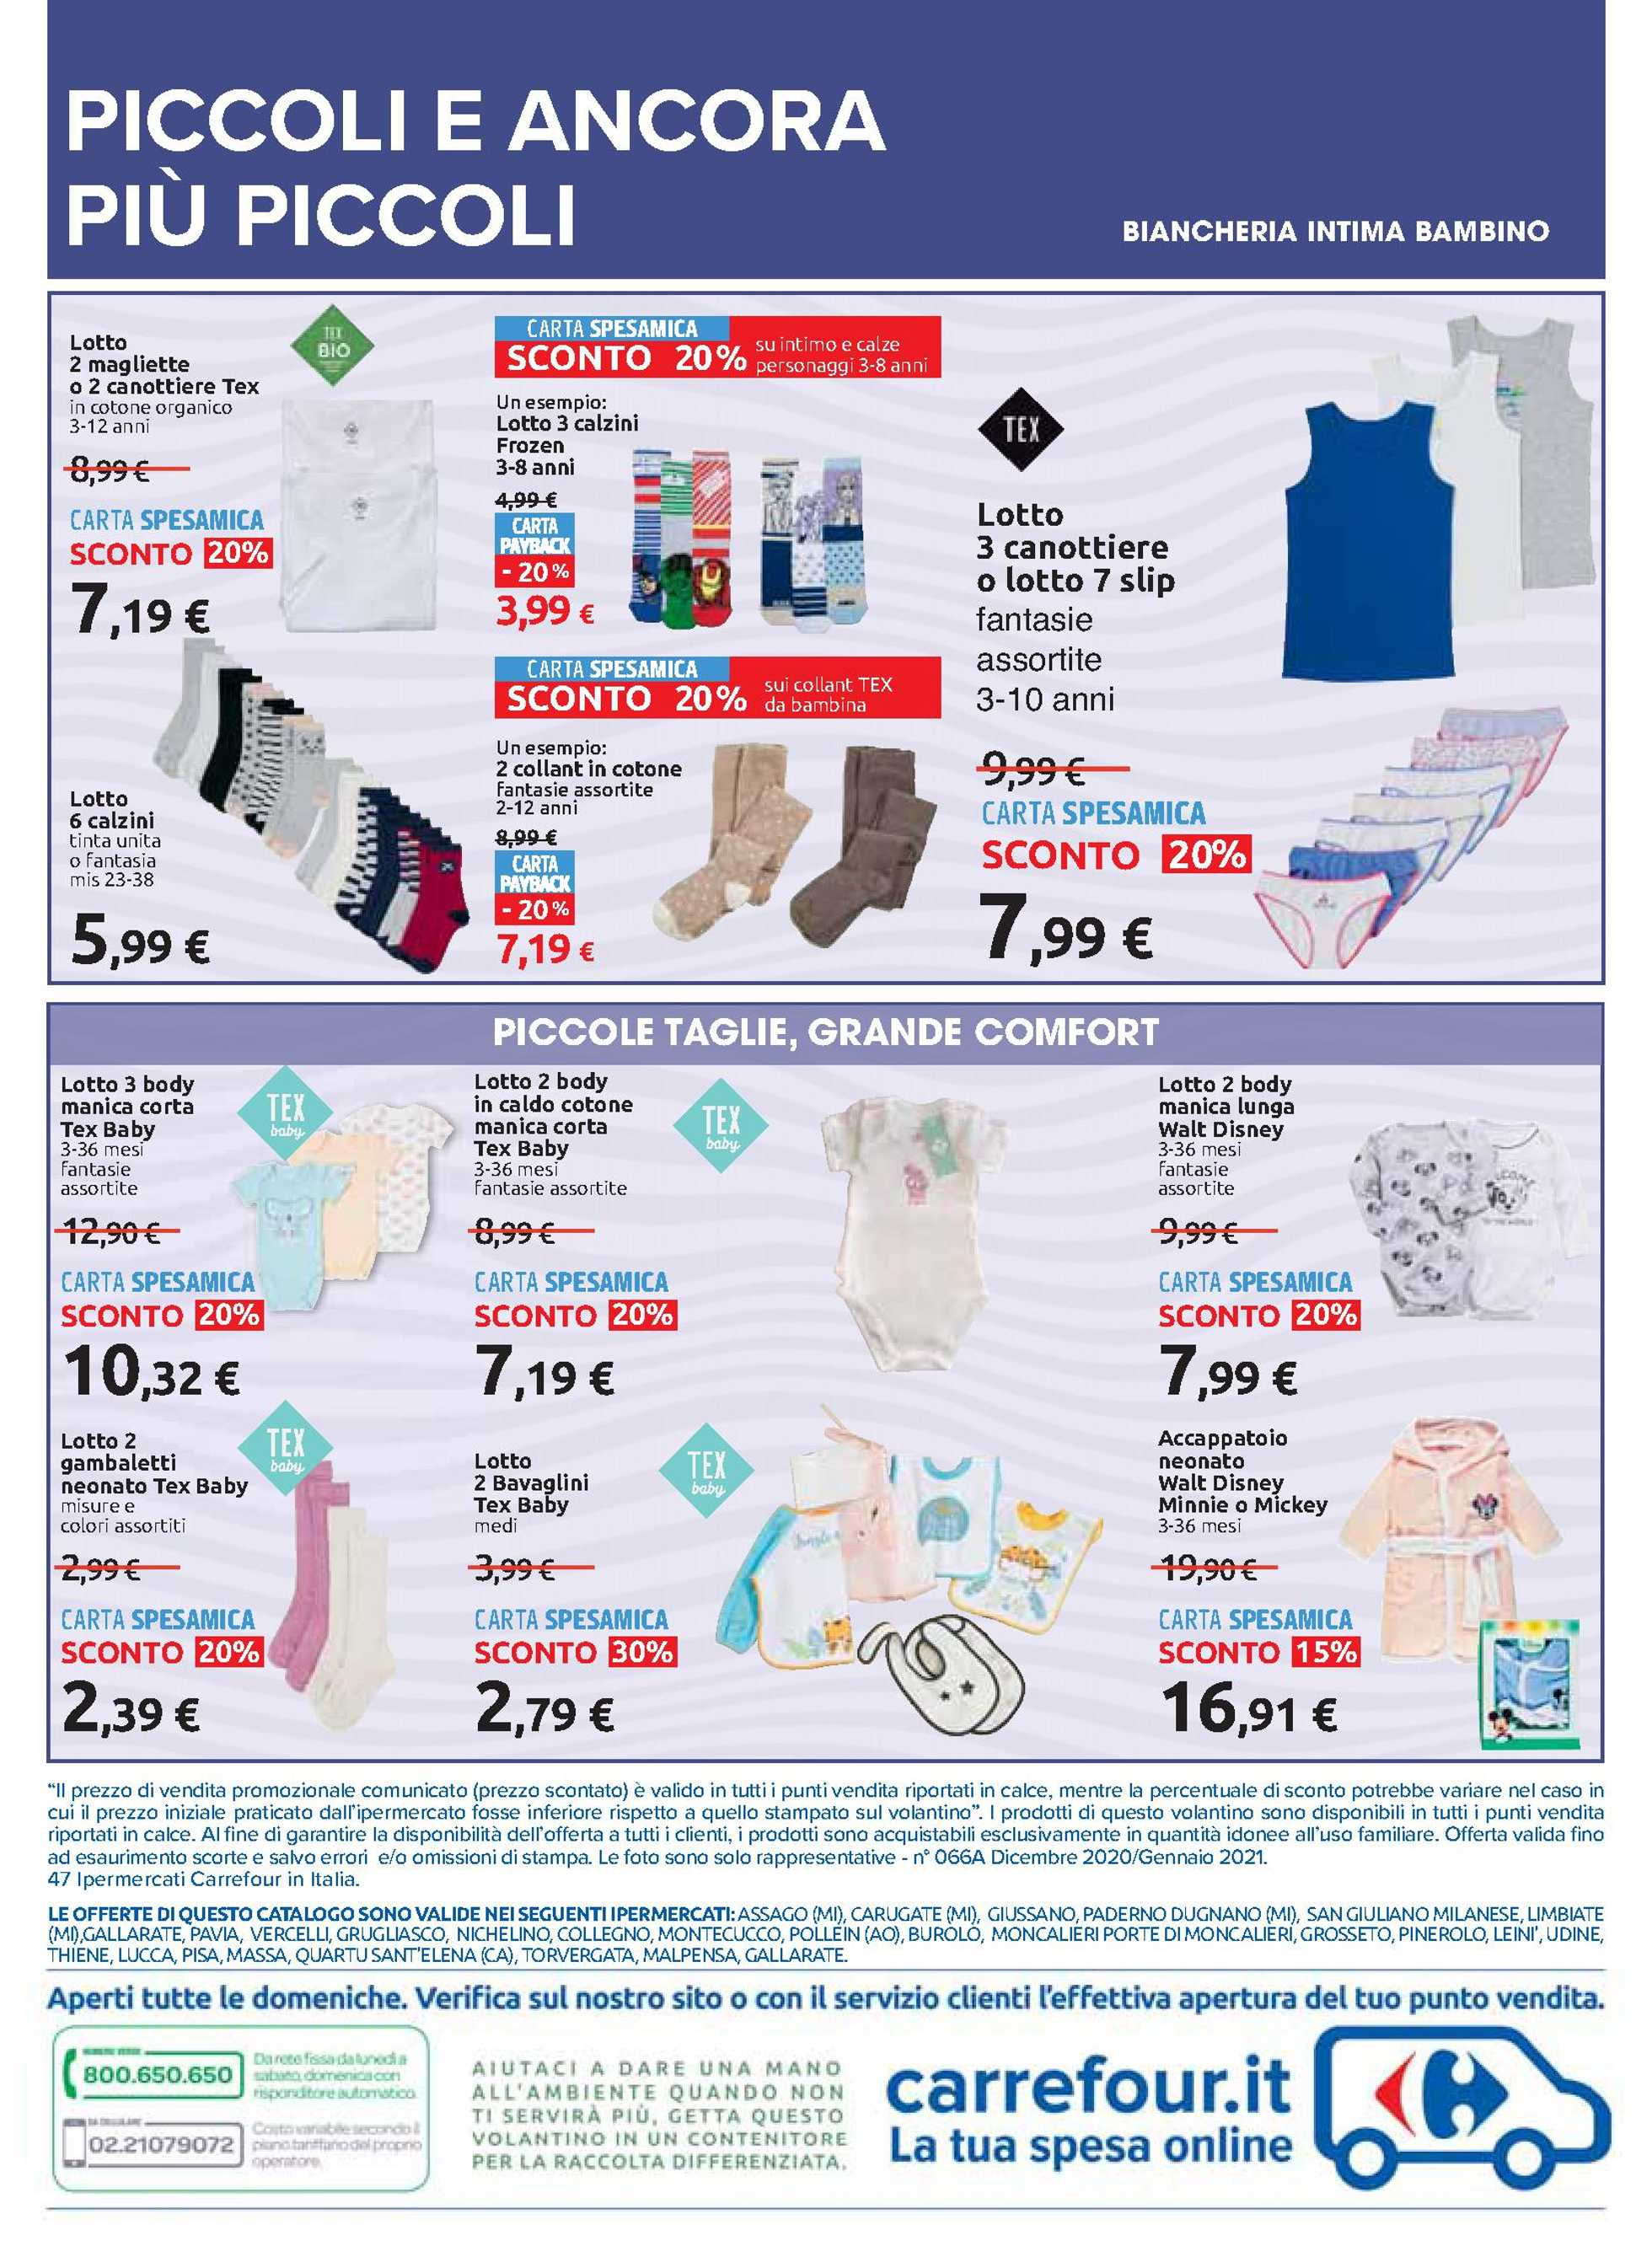 Carrefour Iper - offerte valide dal 28.12.2020 al 24.01.2021 - pagina 4.